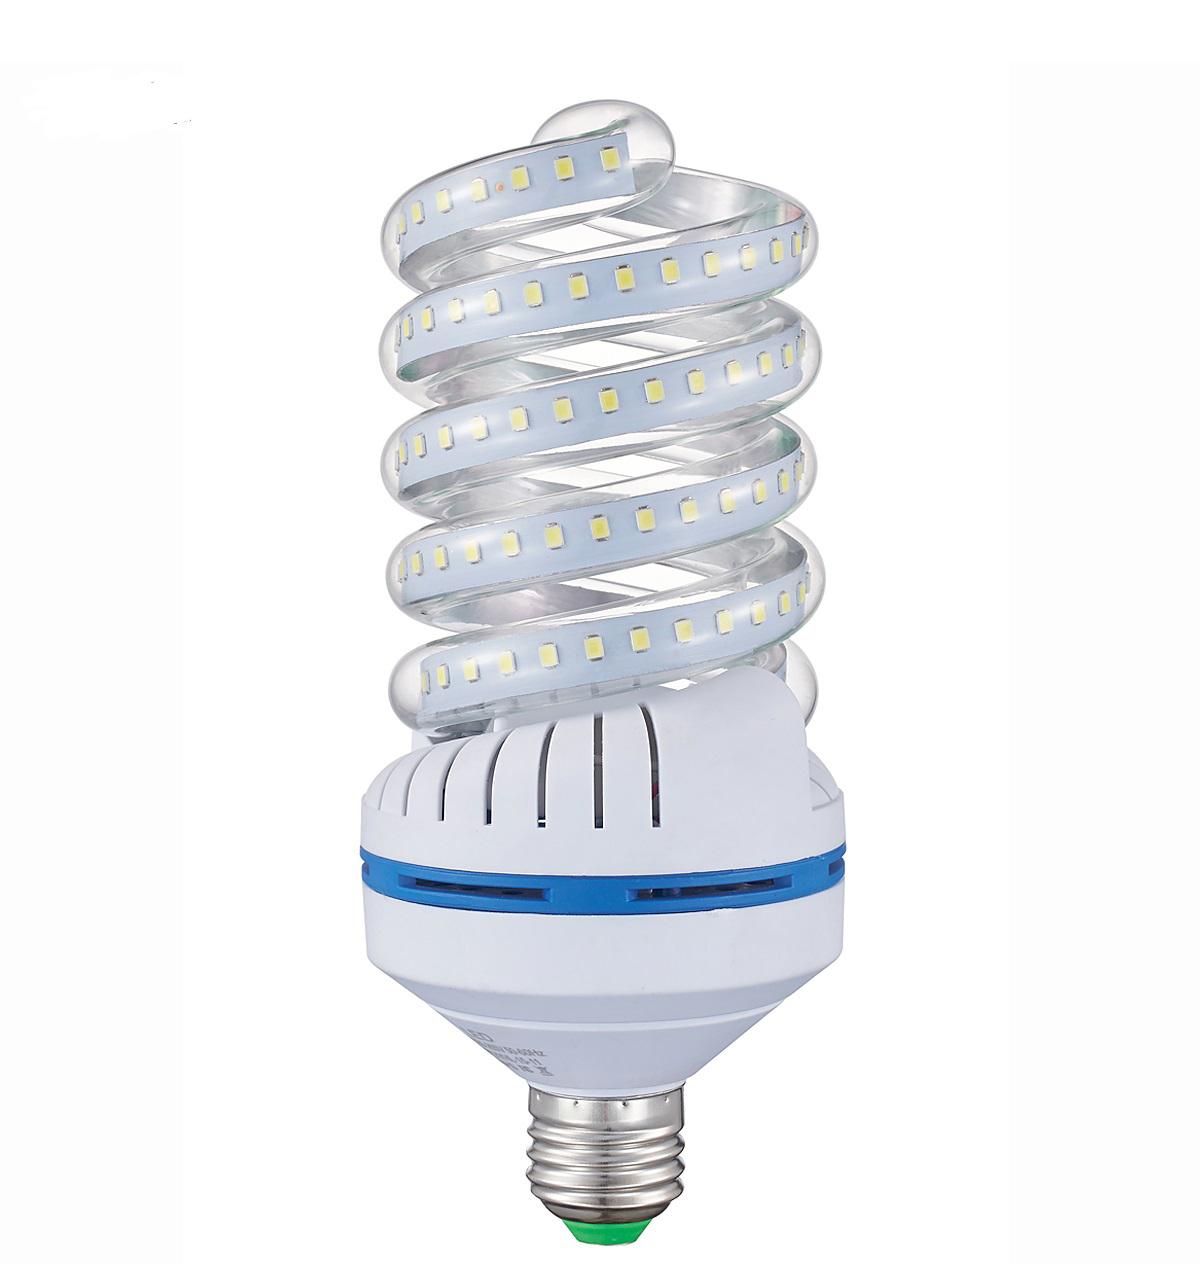 24W SPIRAL LED corn light bulbs